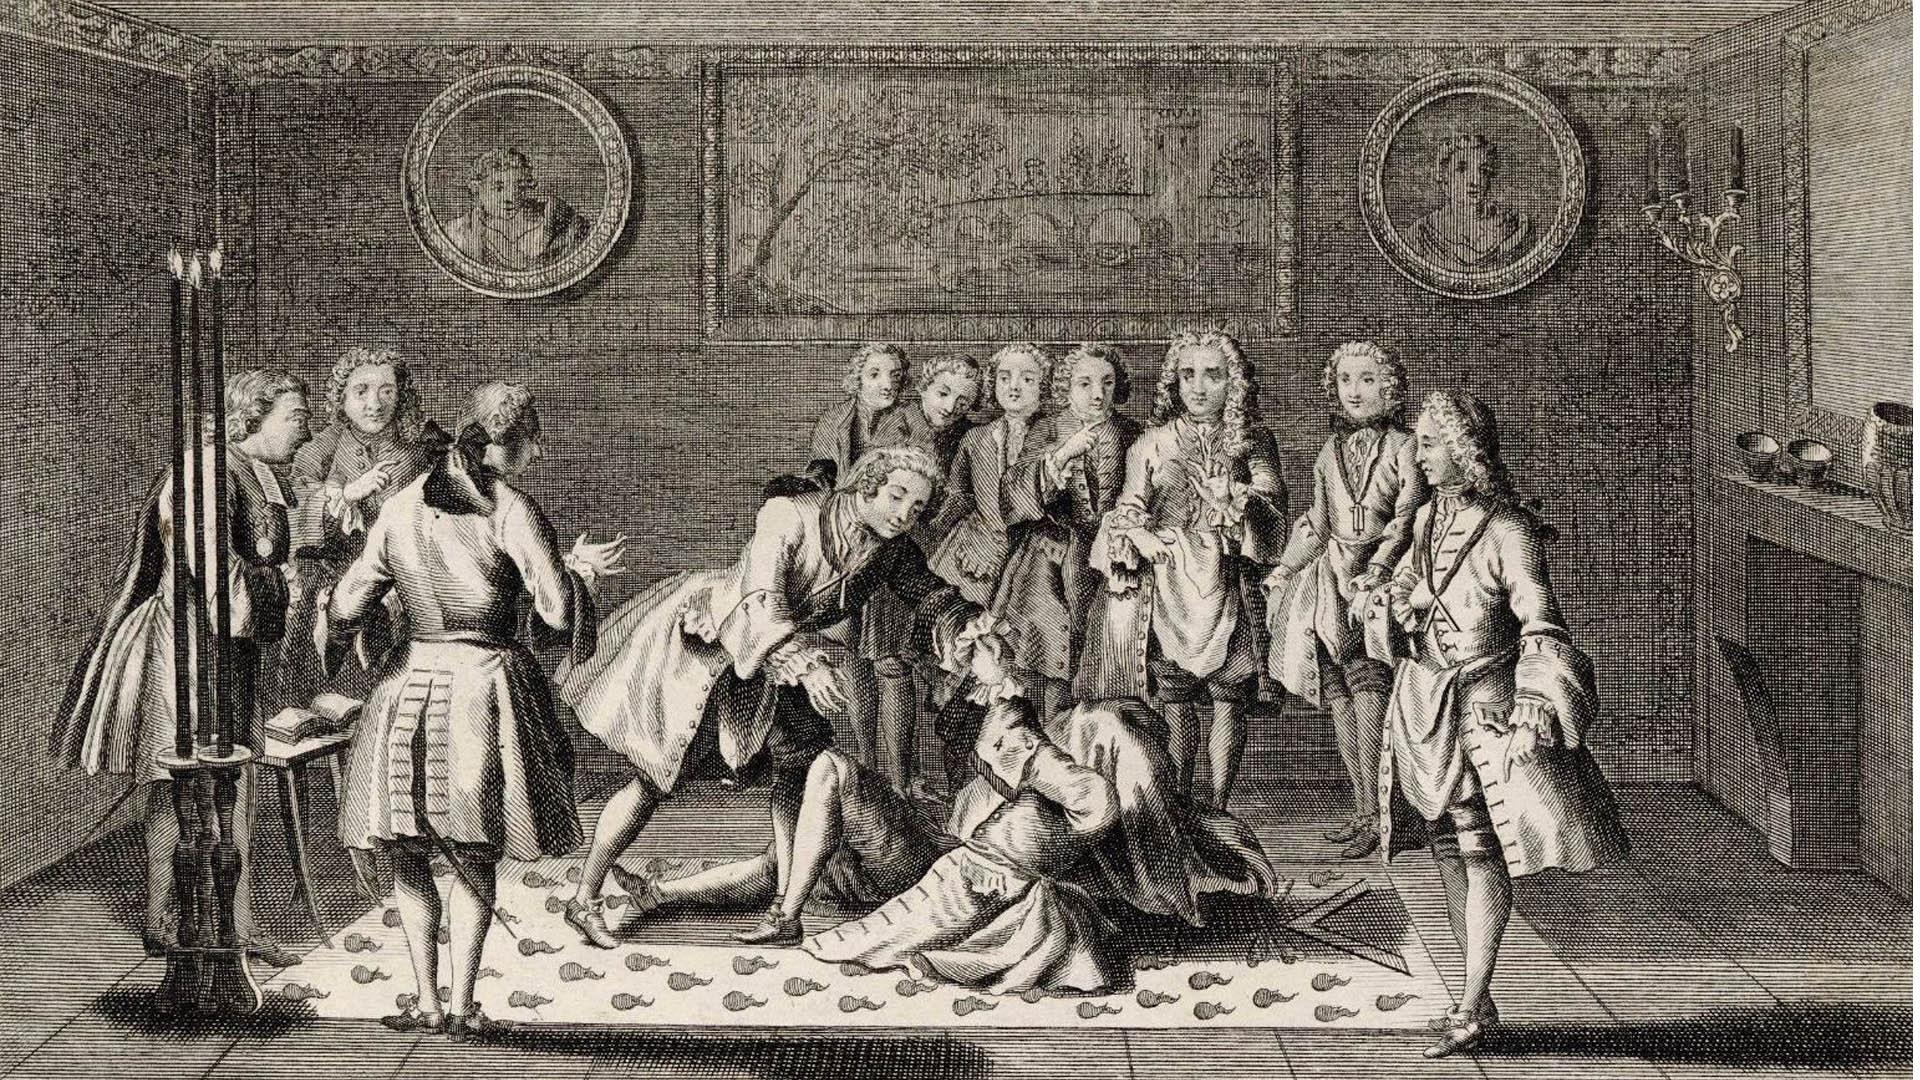 Cut out ceremonial handshakes to fight coronavirus, freemasons told